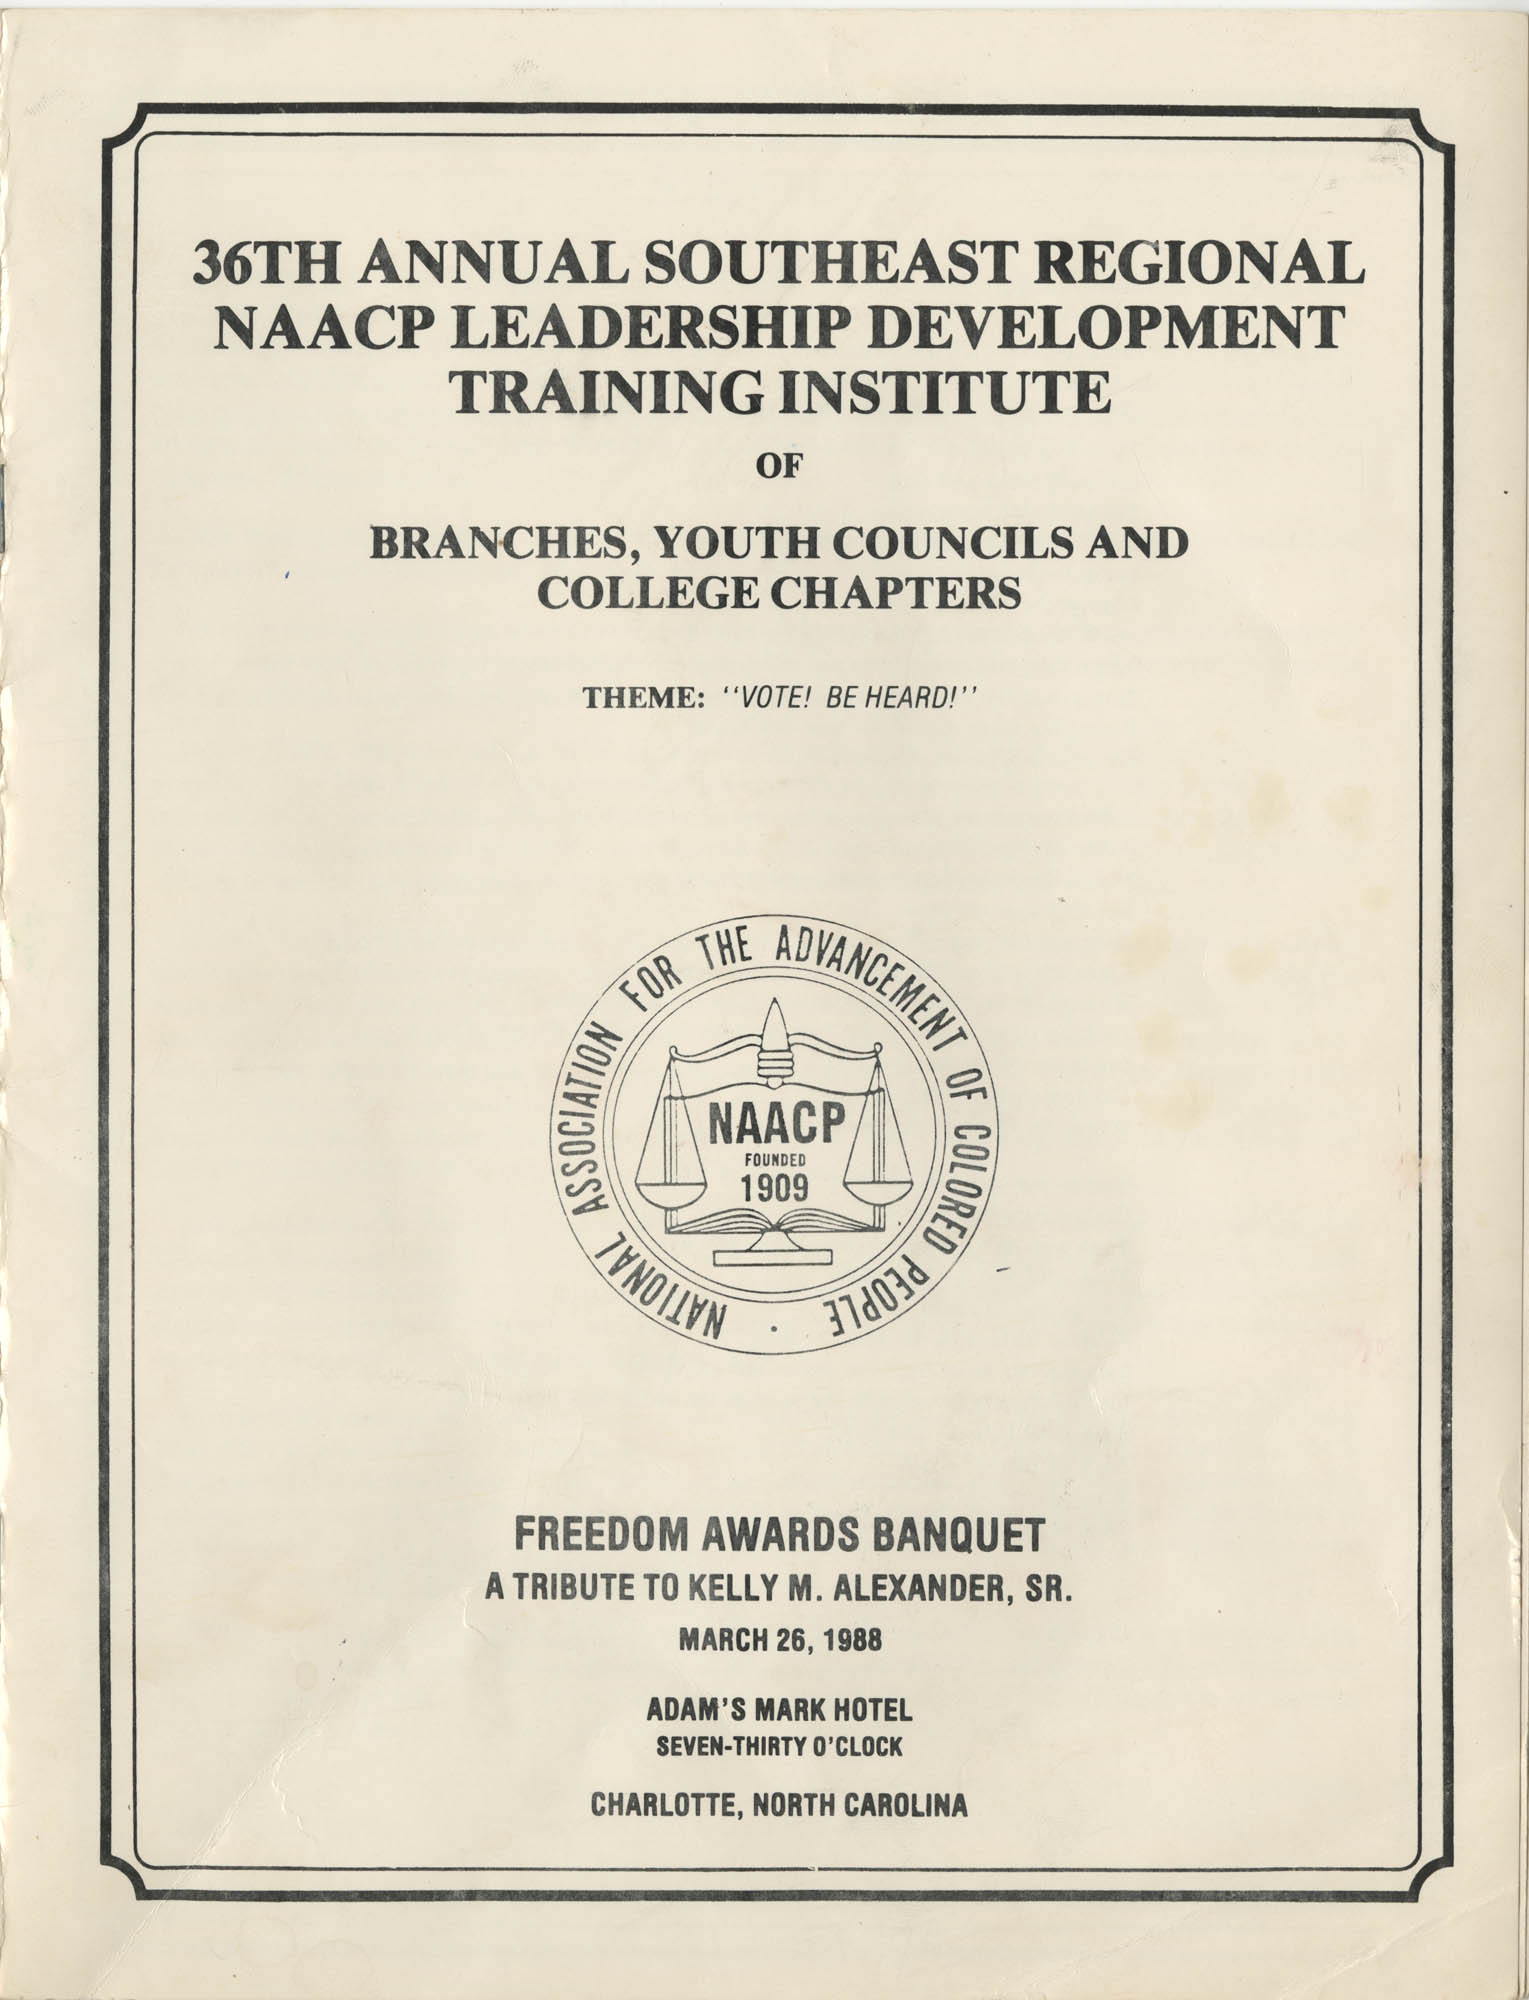 36th Annual Southeast Regional NAACP Leadership Development Training Institute